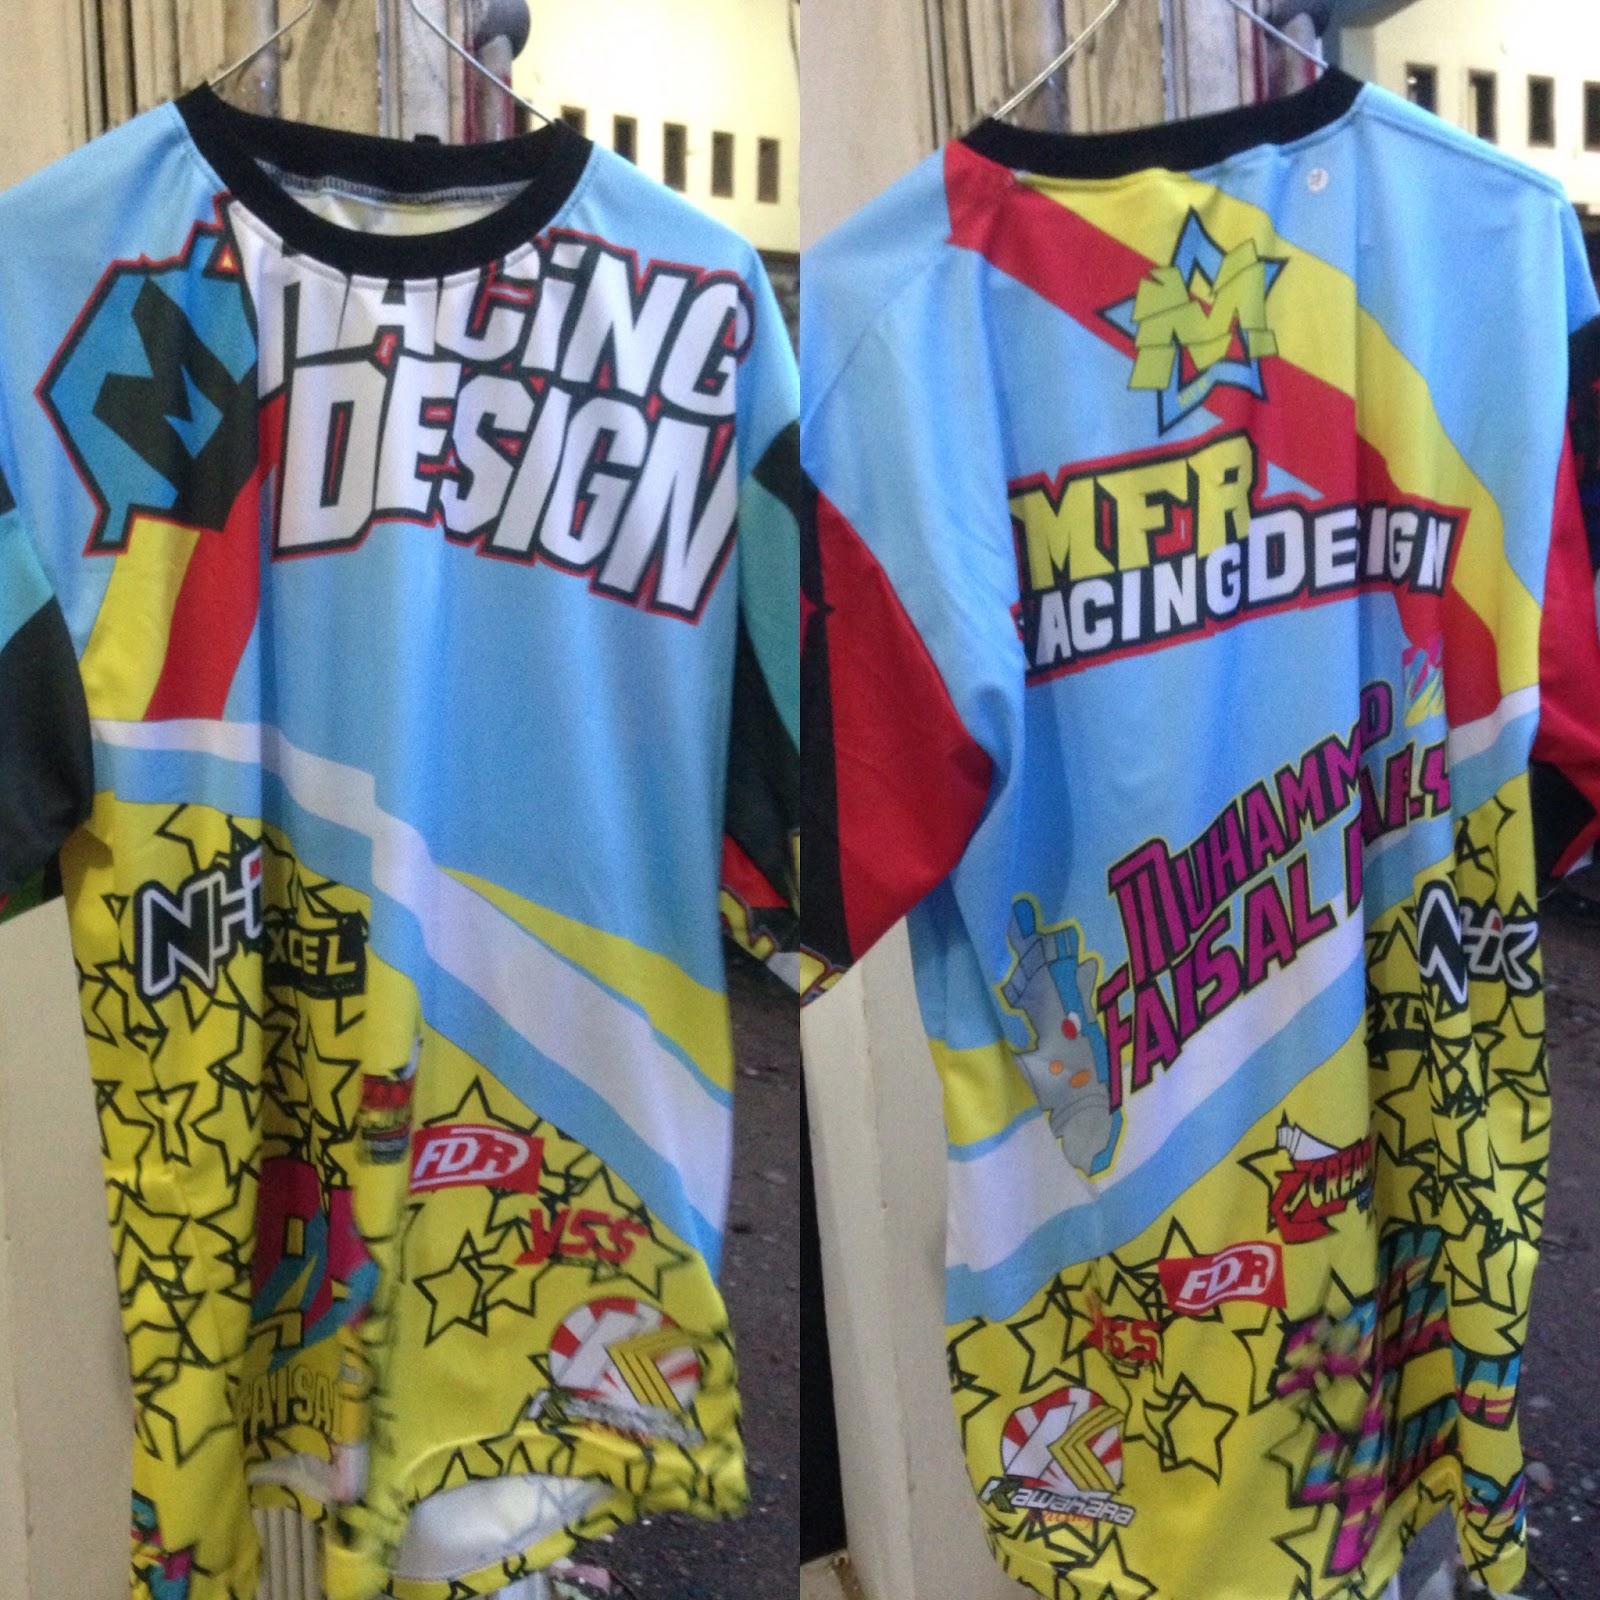 Baju Fullprint Makassar Kaos Anak Printing Jersey Custom Jepara Print Murah Full Buat Event Partai Sablon Konveksi